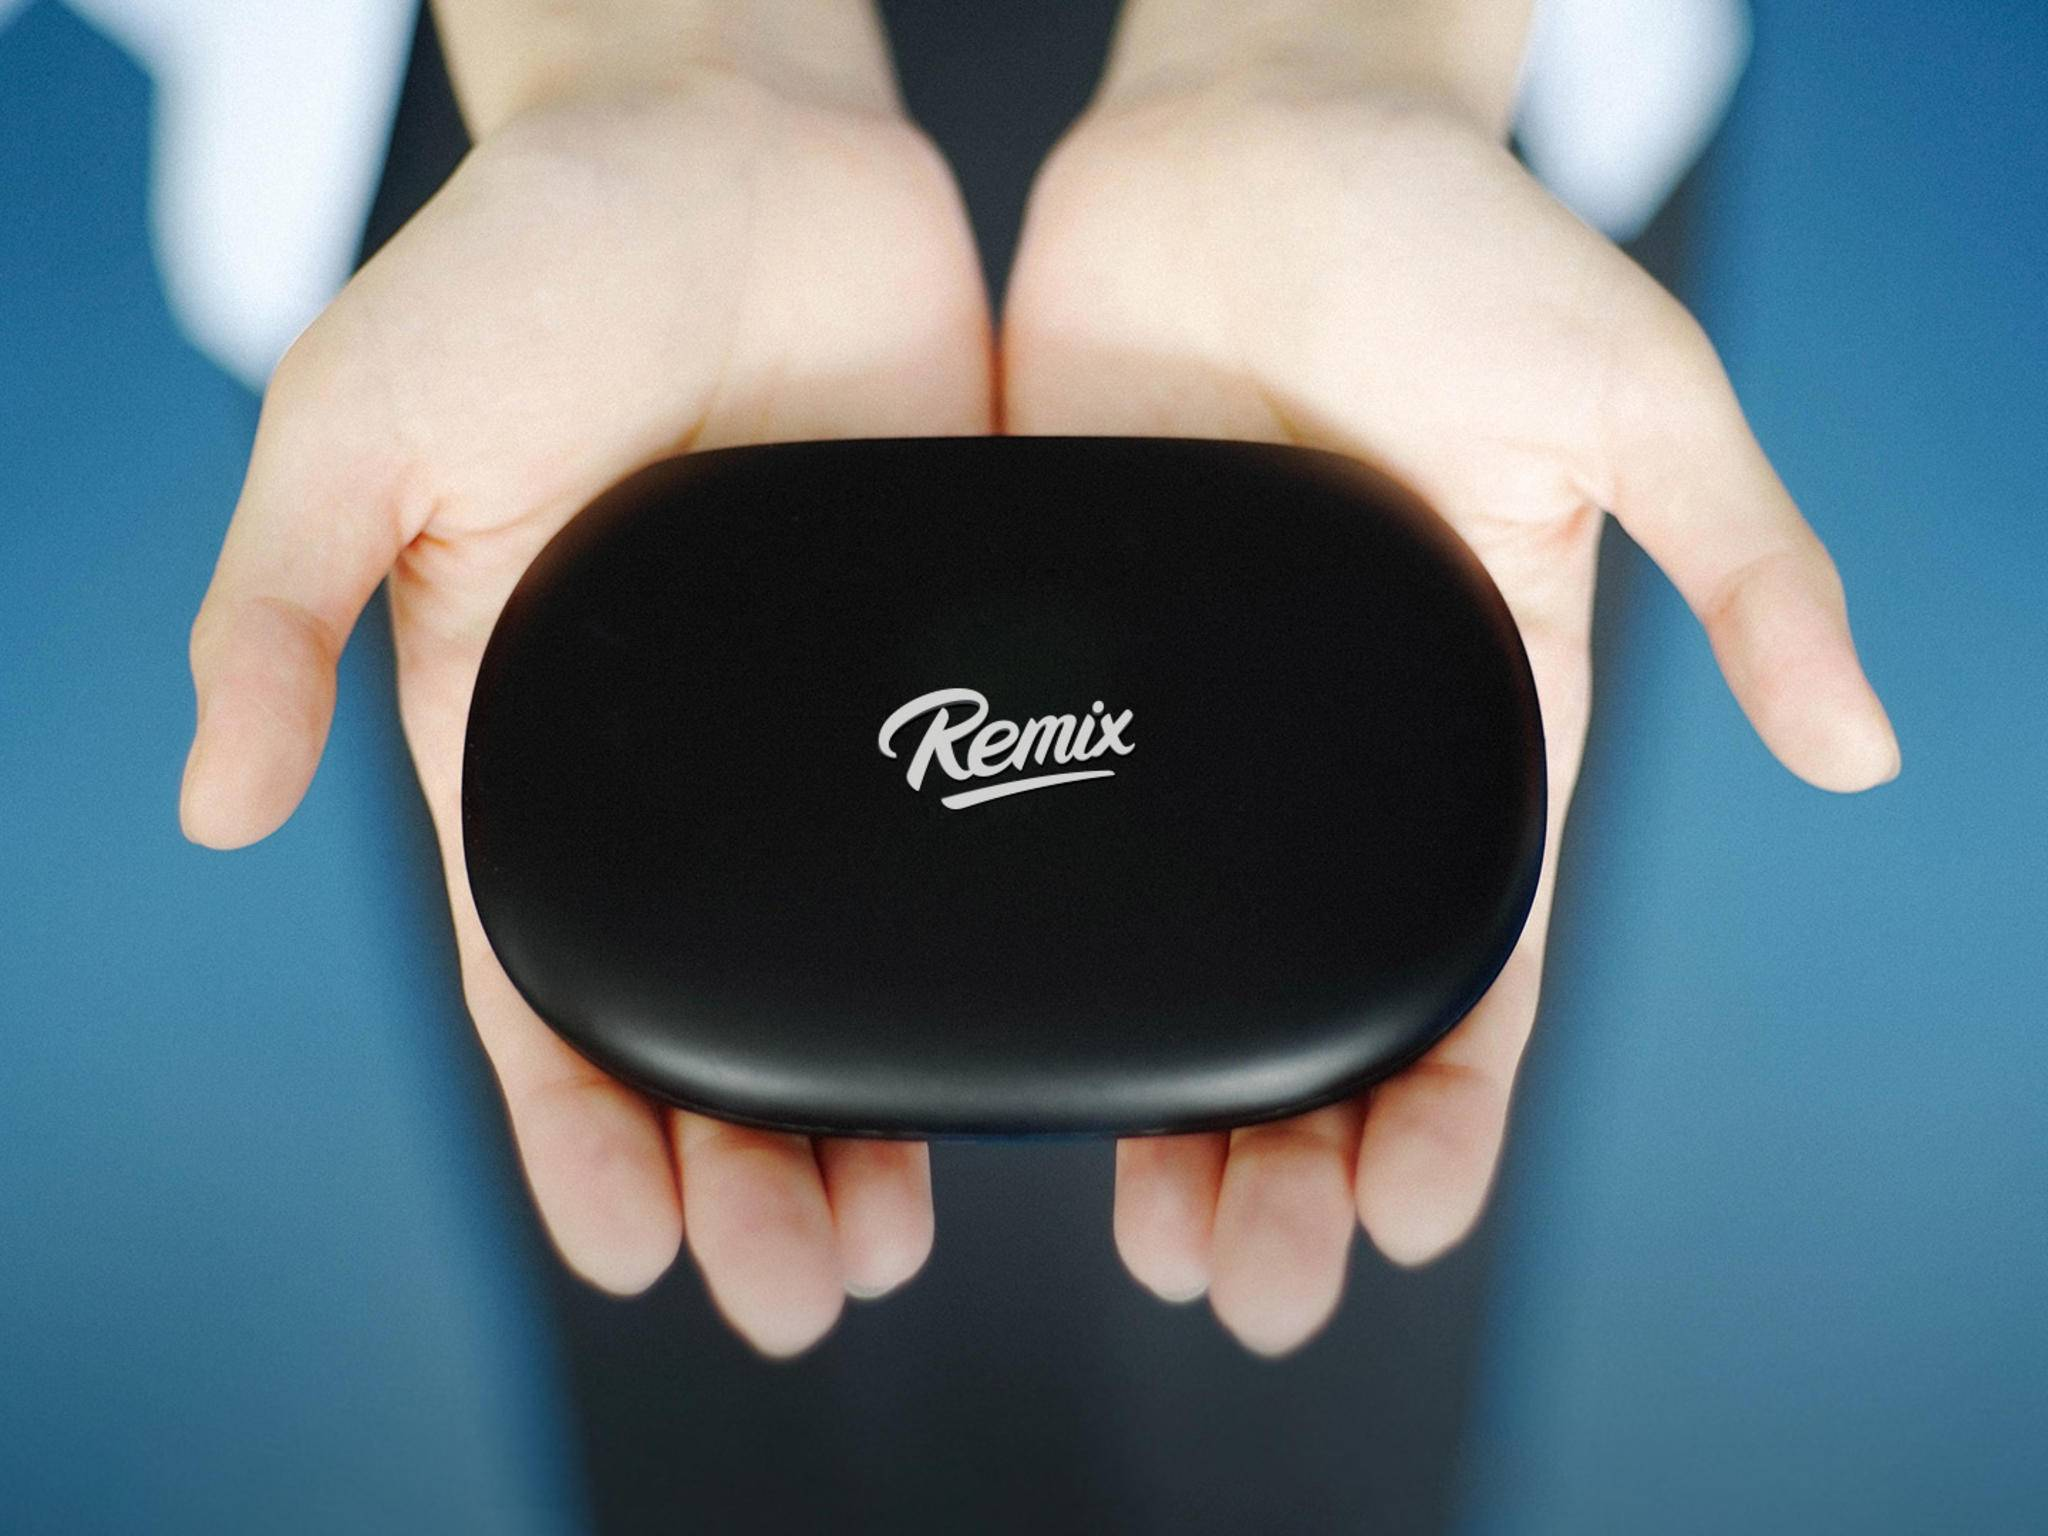 Remix Mini Kickstarter